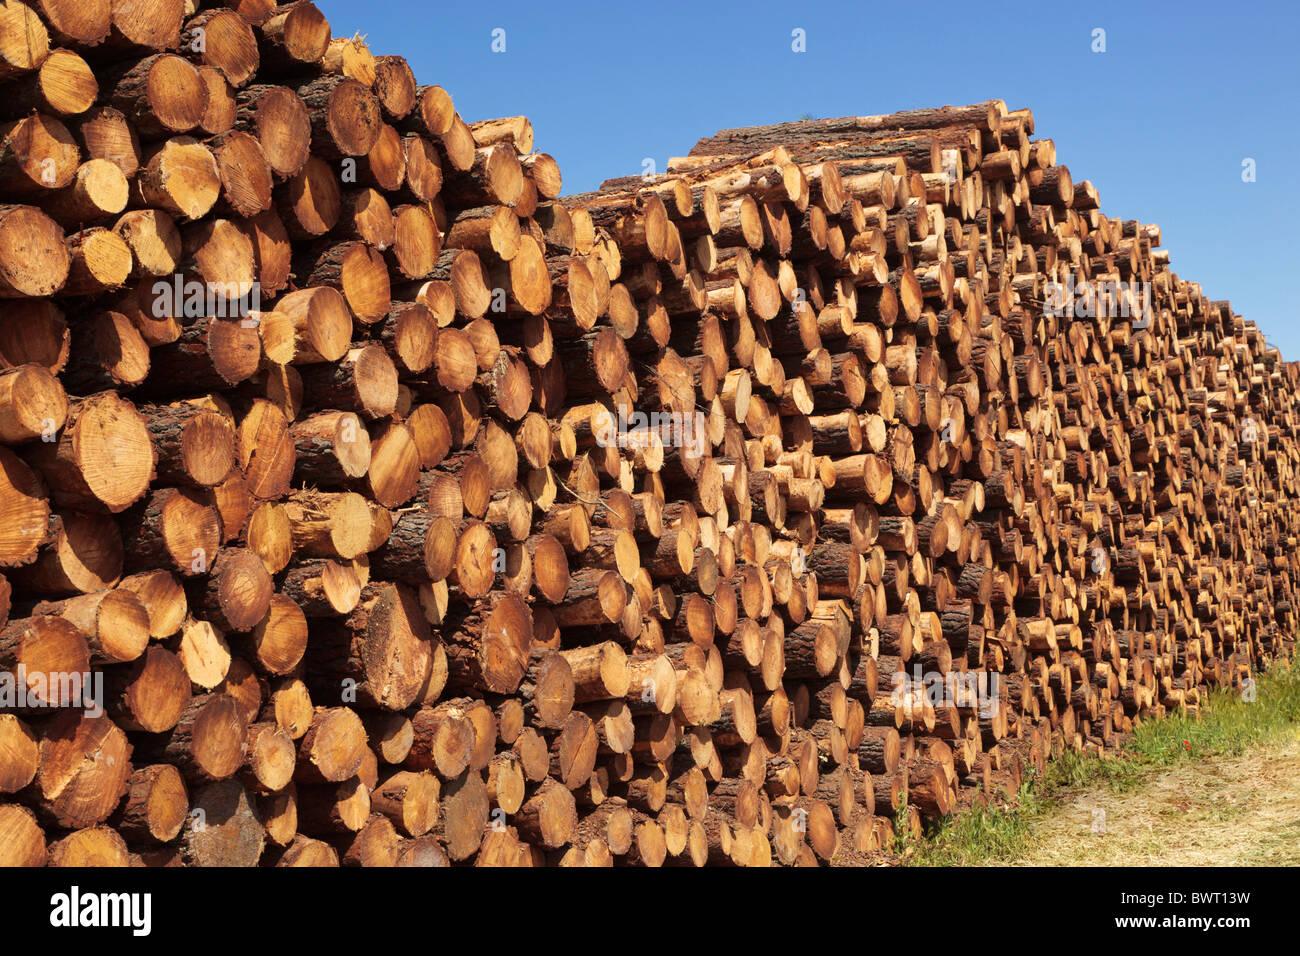 Wood piles near Bohonal de Ibor, Caceres Province, Spain - Stock Image